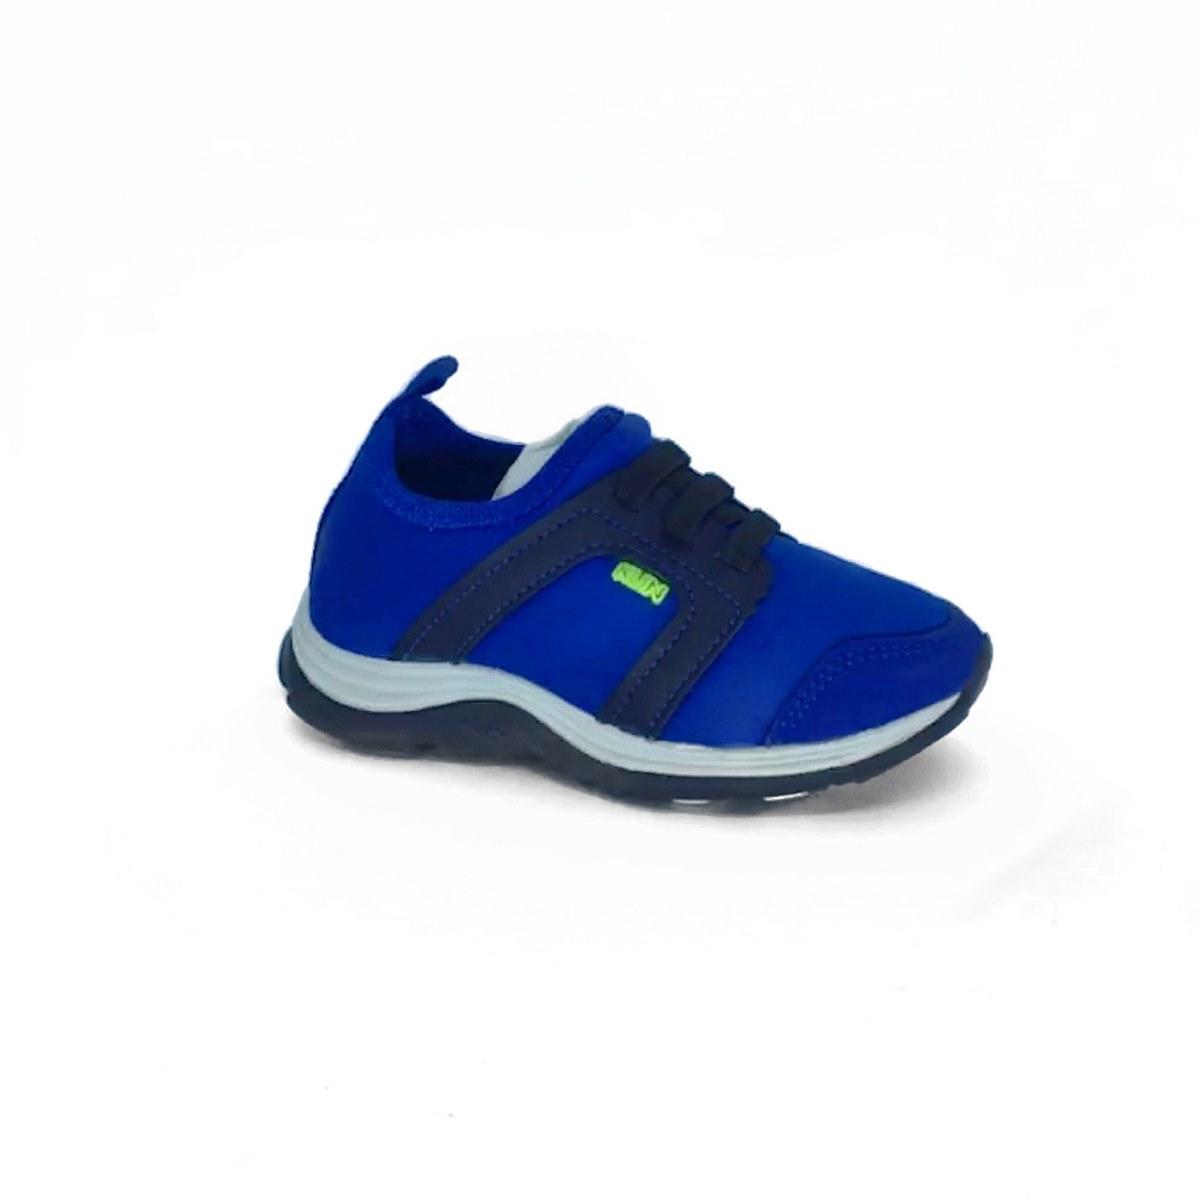 Tênis Azul/Preto Klin